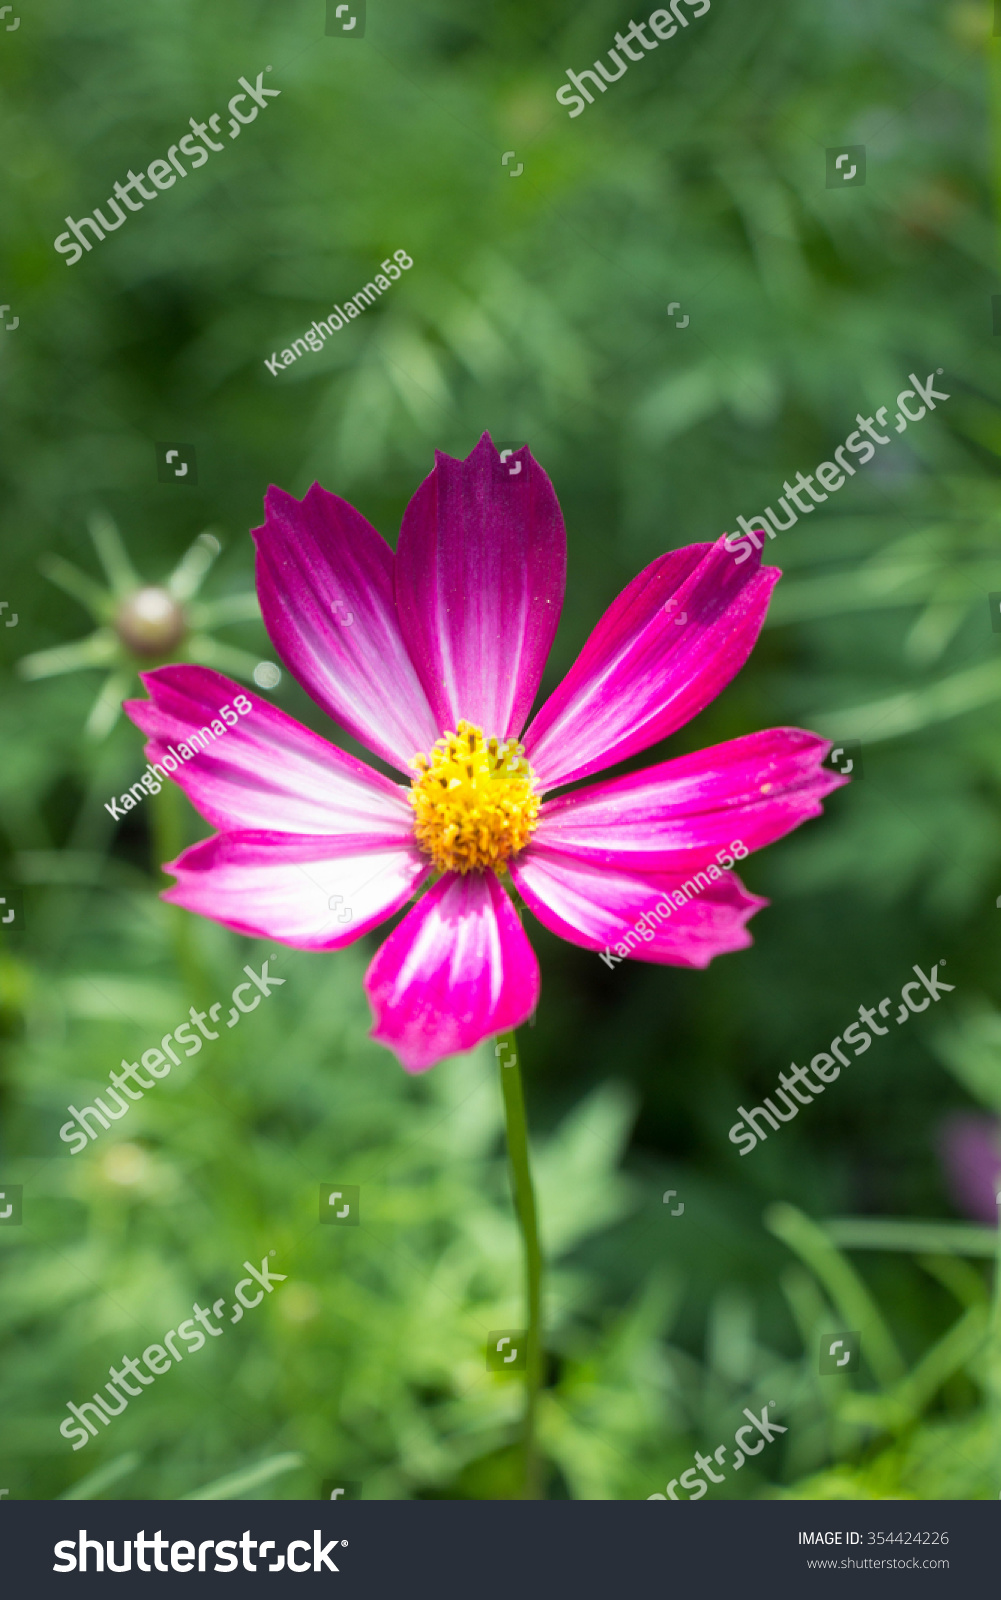 Beautiful winter flowers stock photo edit now 354424226 shutterstock beautiful winter flowers izmirmasajfo